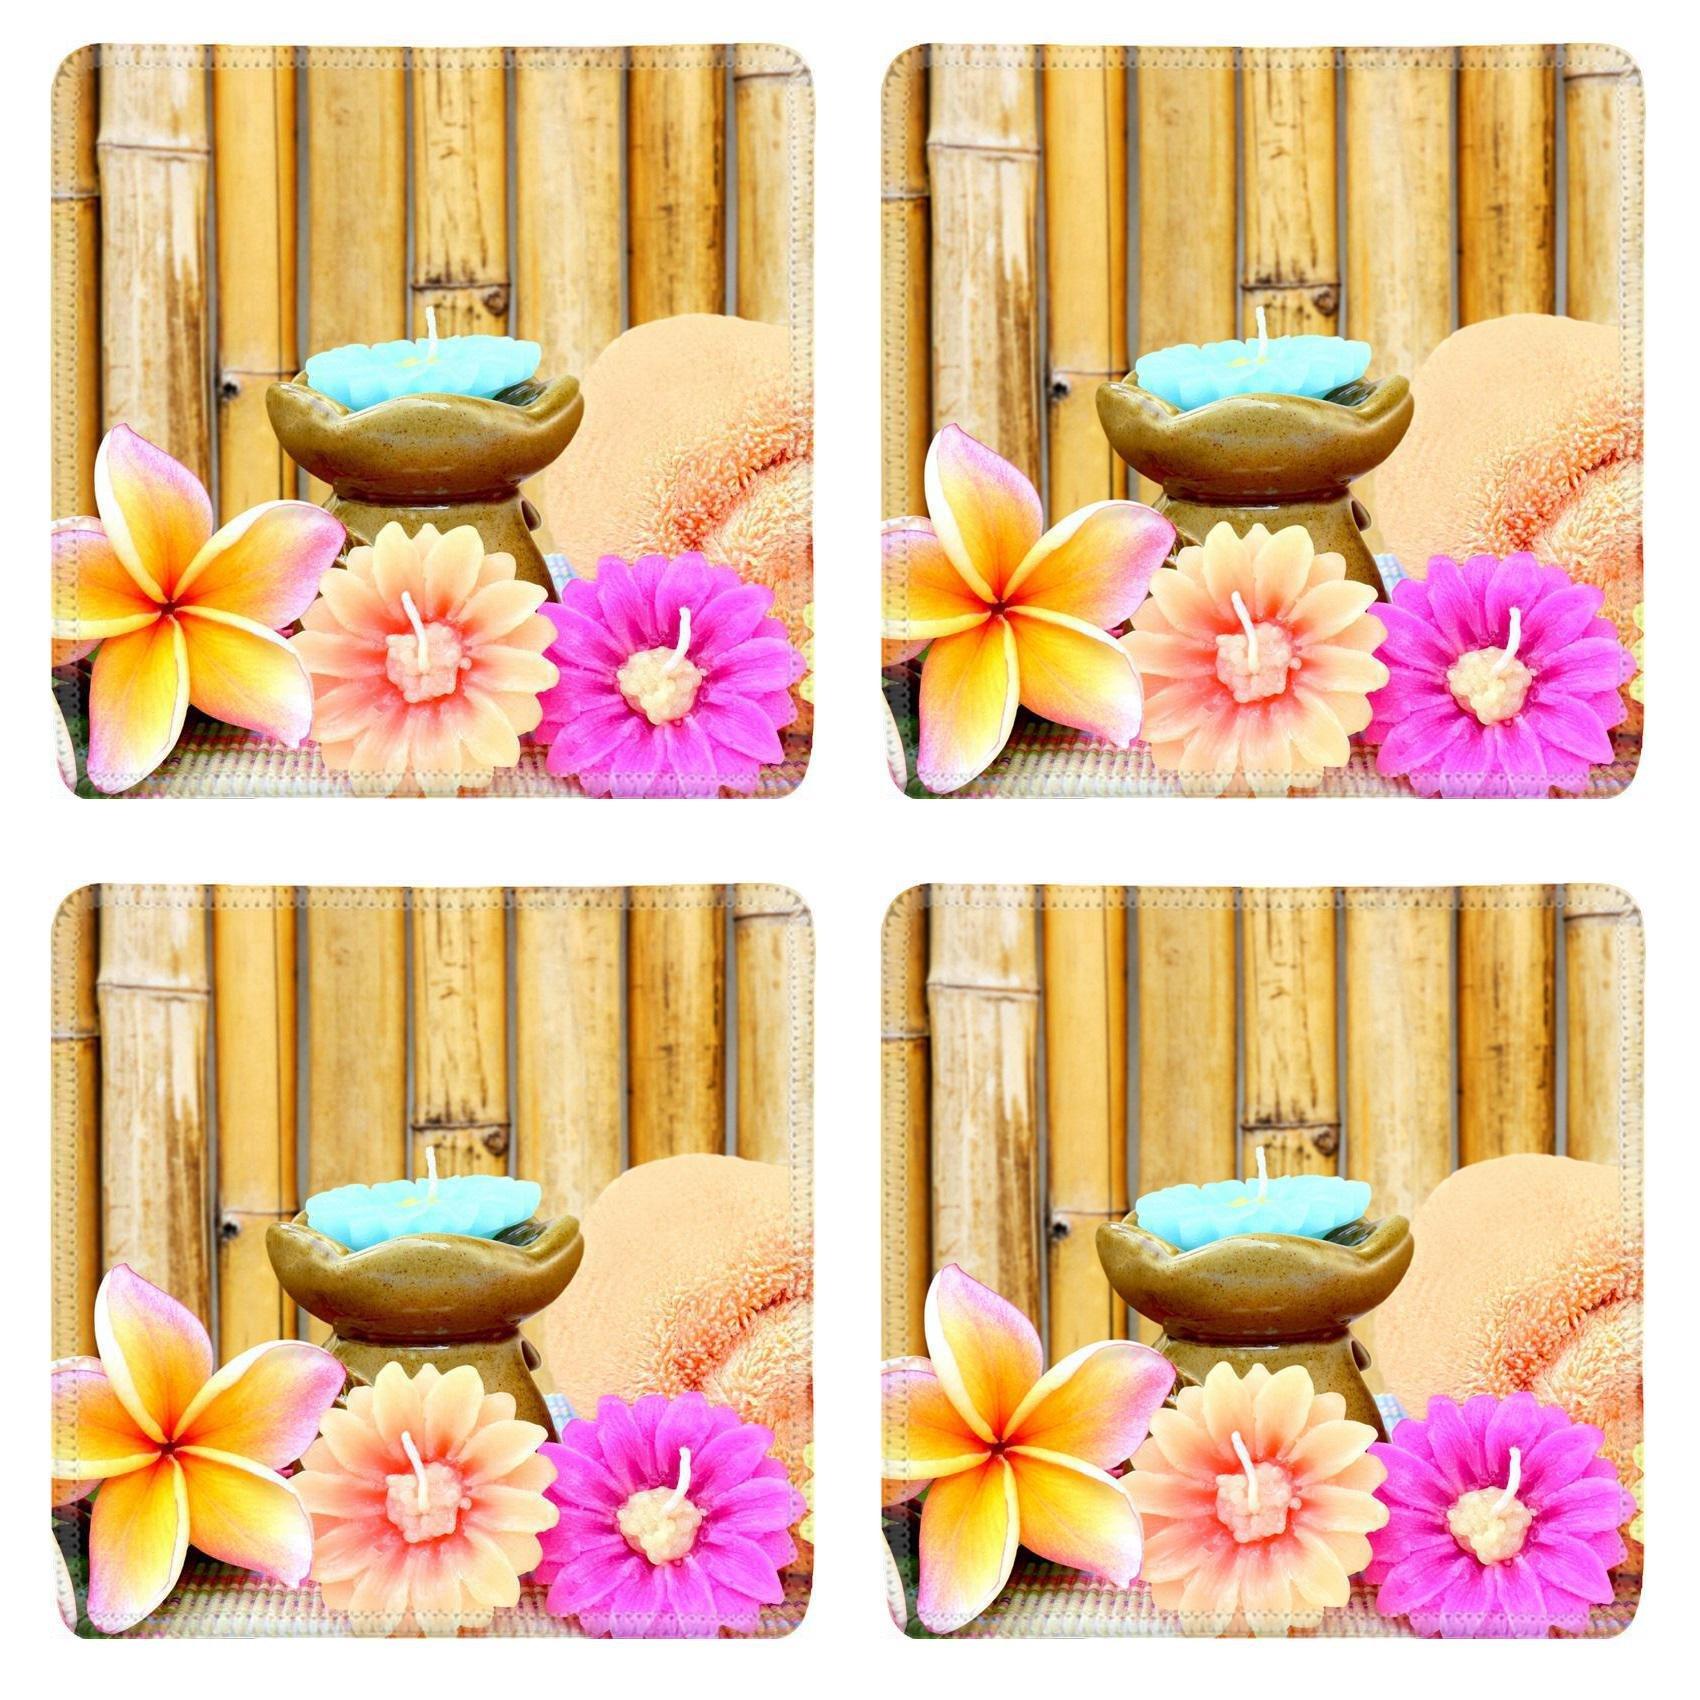 Luxlady Square Coasters Non-Slip Natural Rubber Desk Coasters Spa setting and bamboo background IMAGE ID 27500137